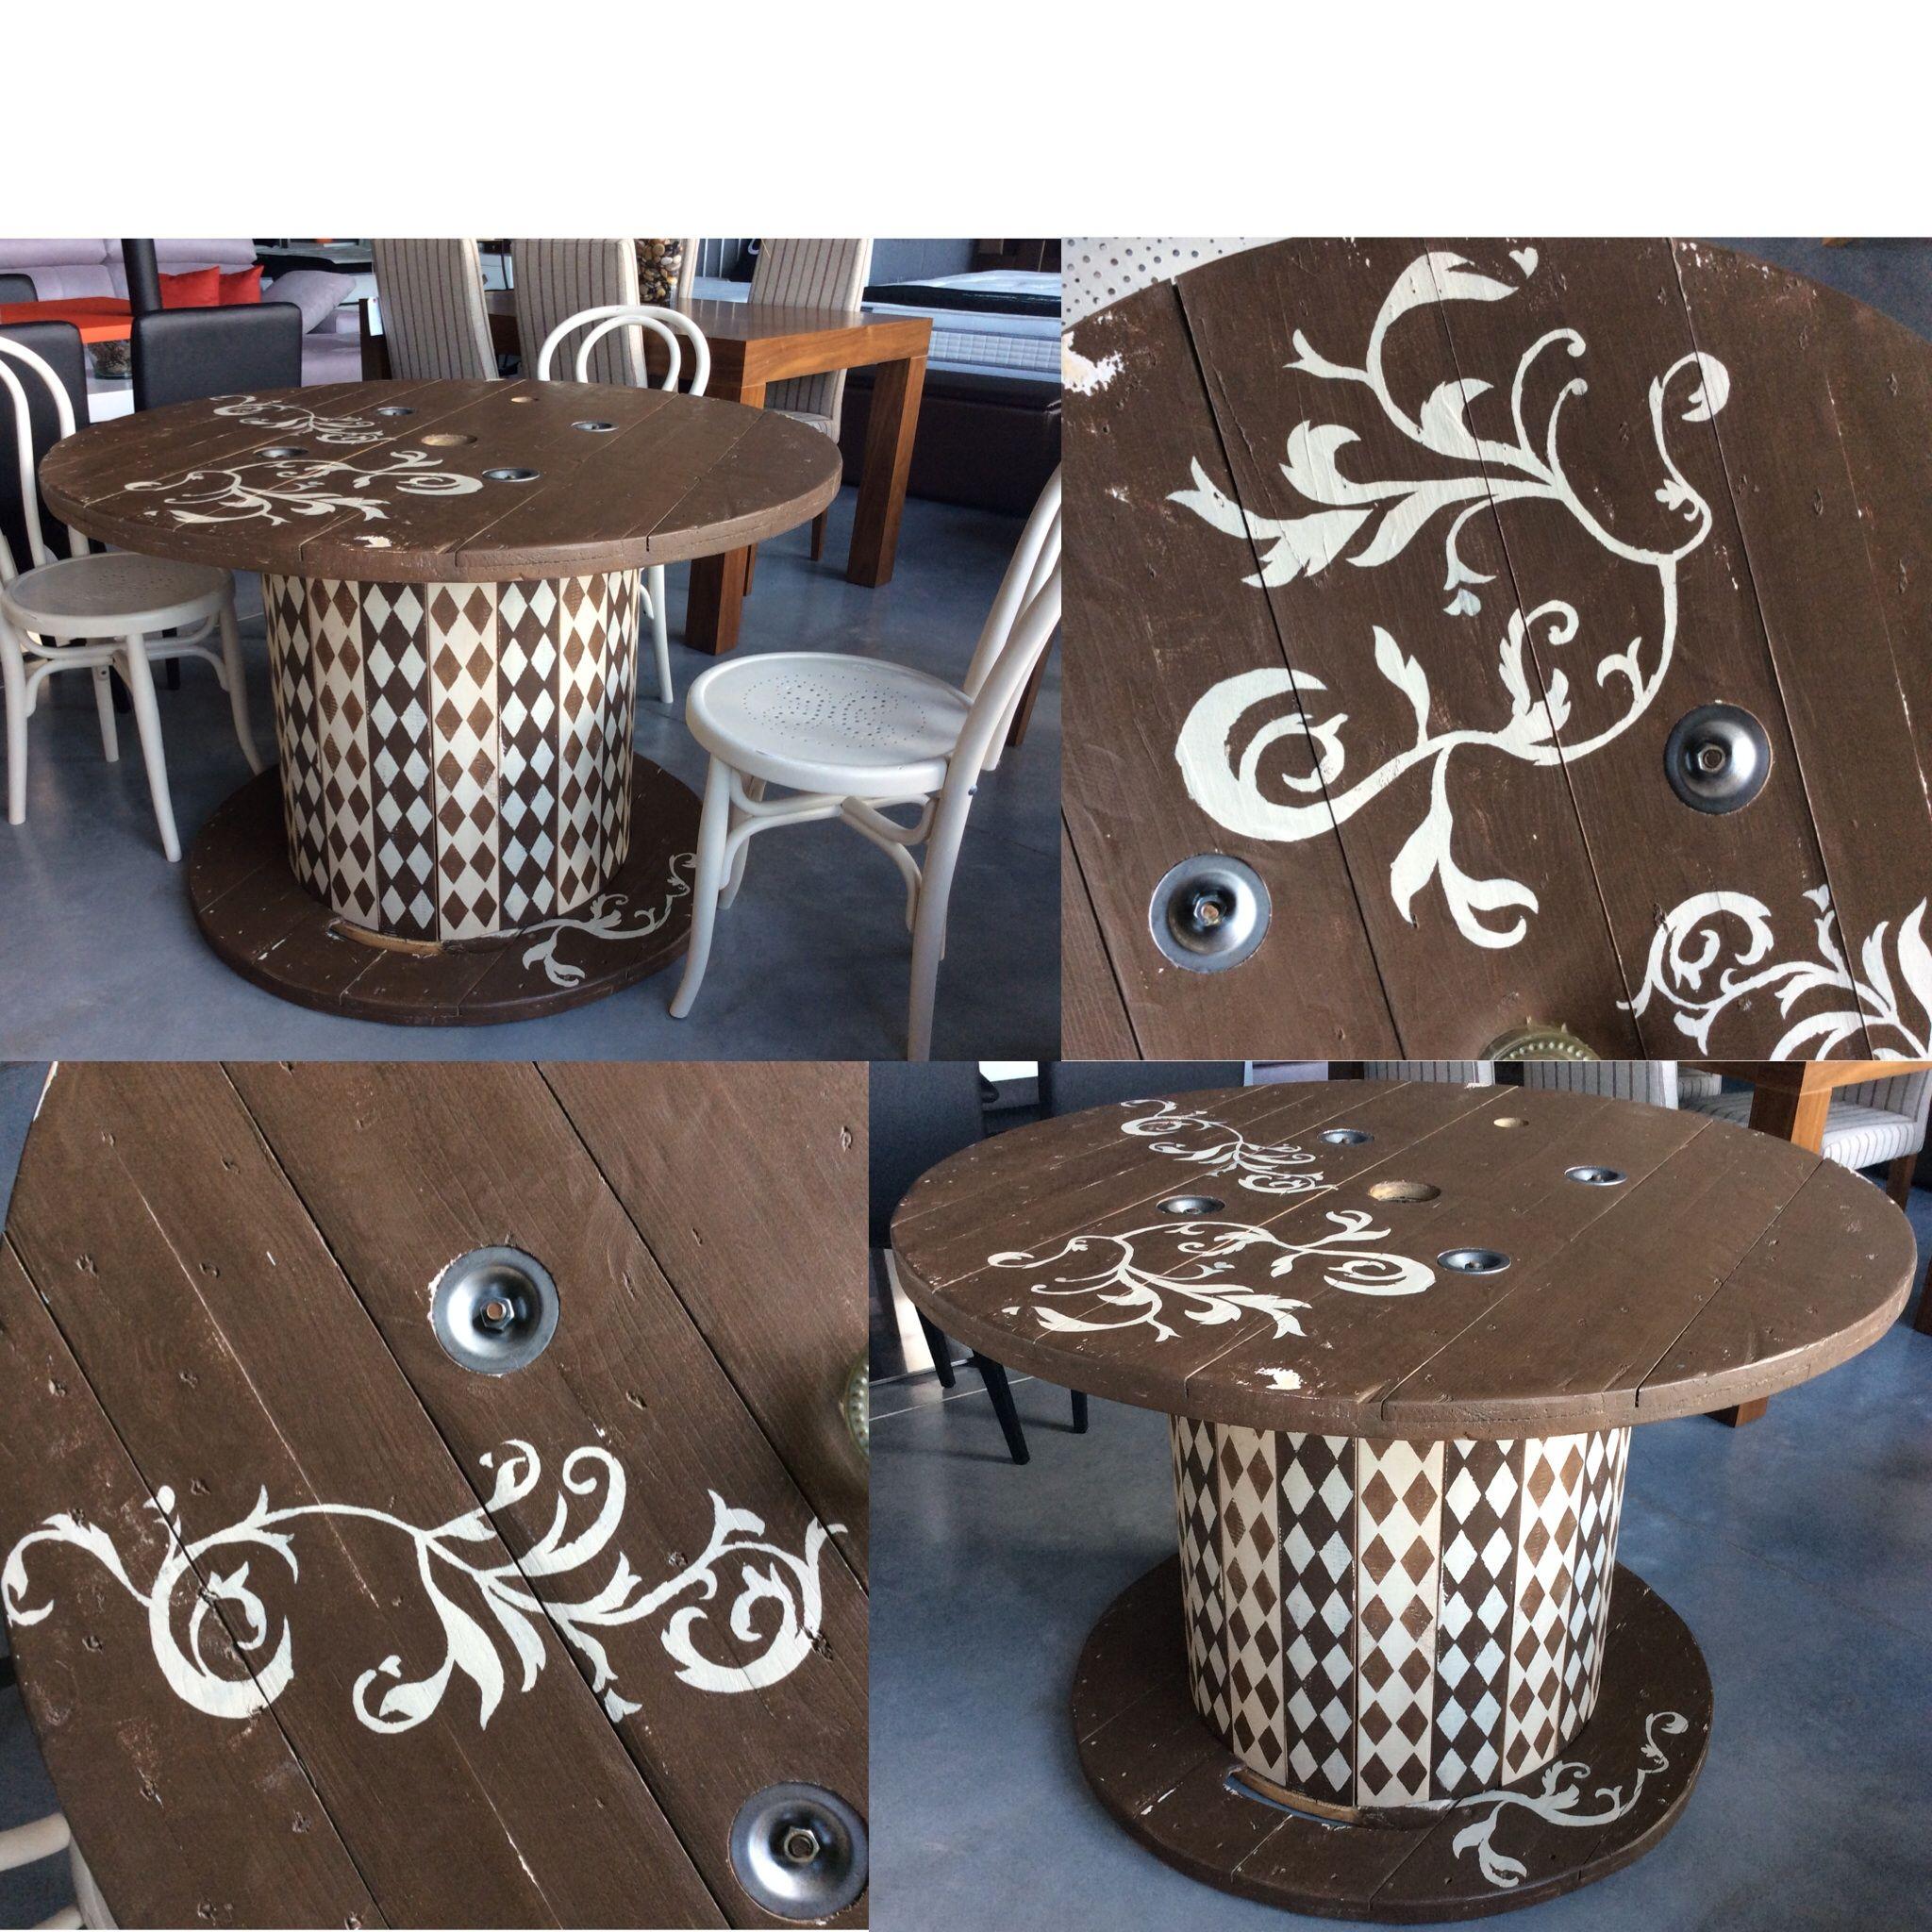 Mesa de bobina de cable reciclada pintada a mano muebles for Muebles reciclados